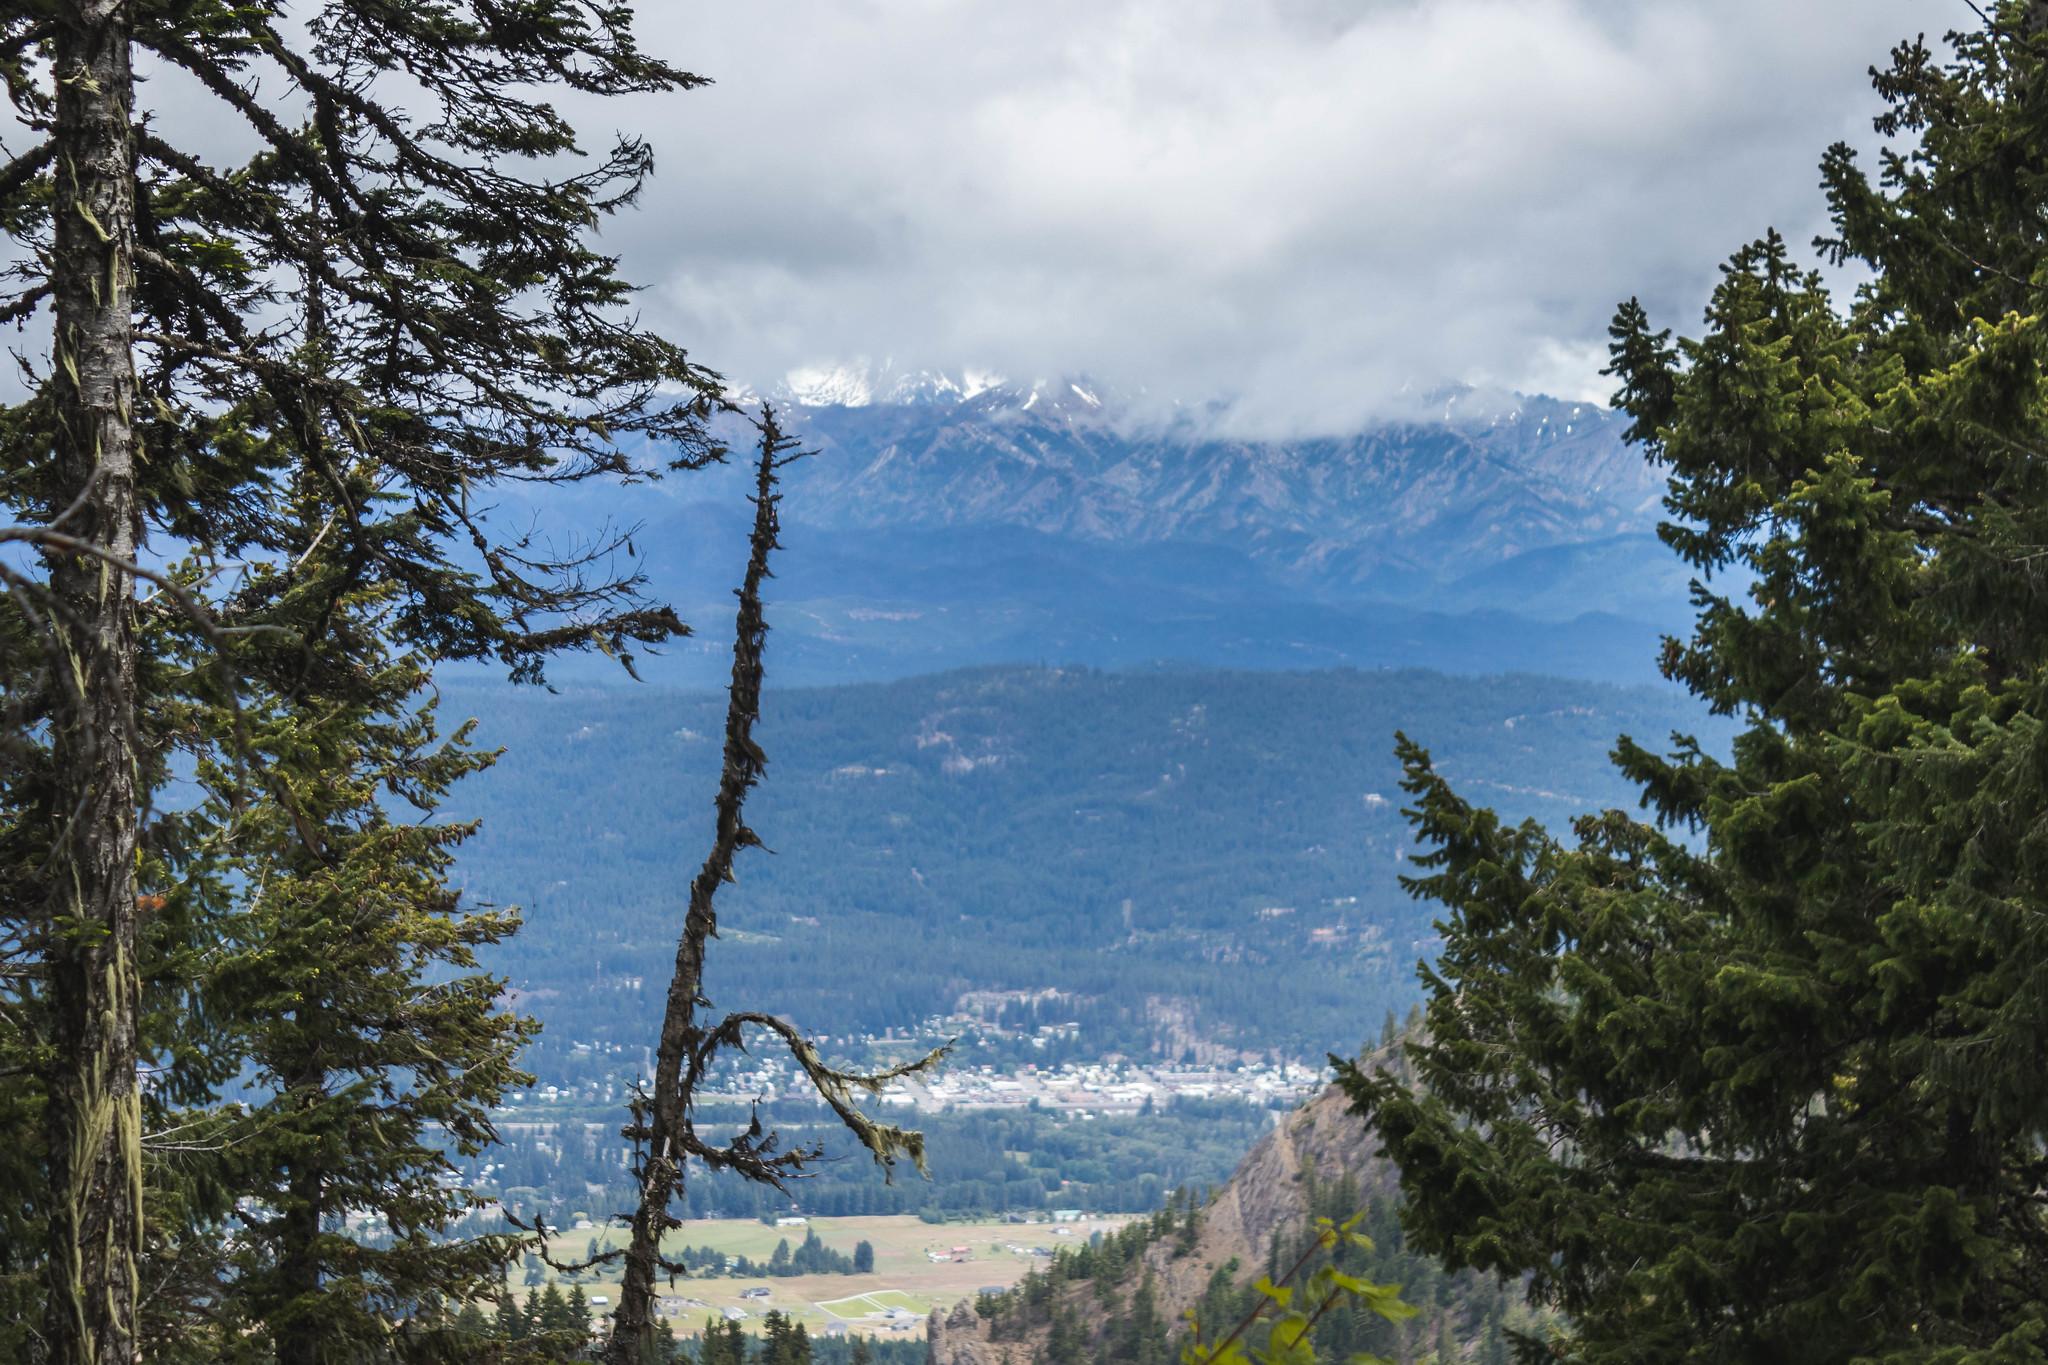 North view on South Clem Ridge East Peak #1